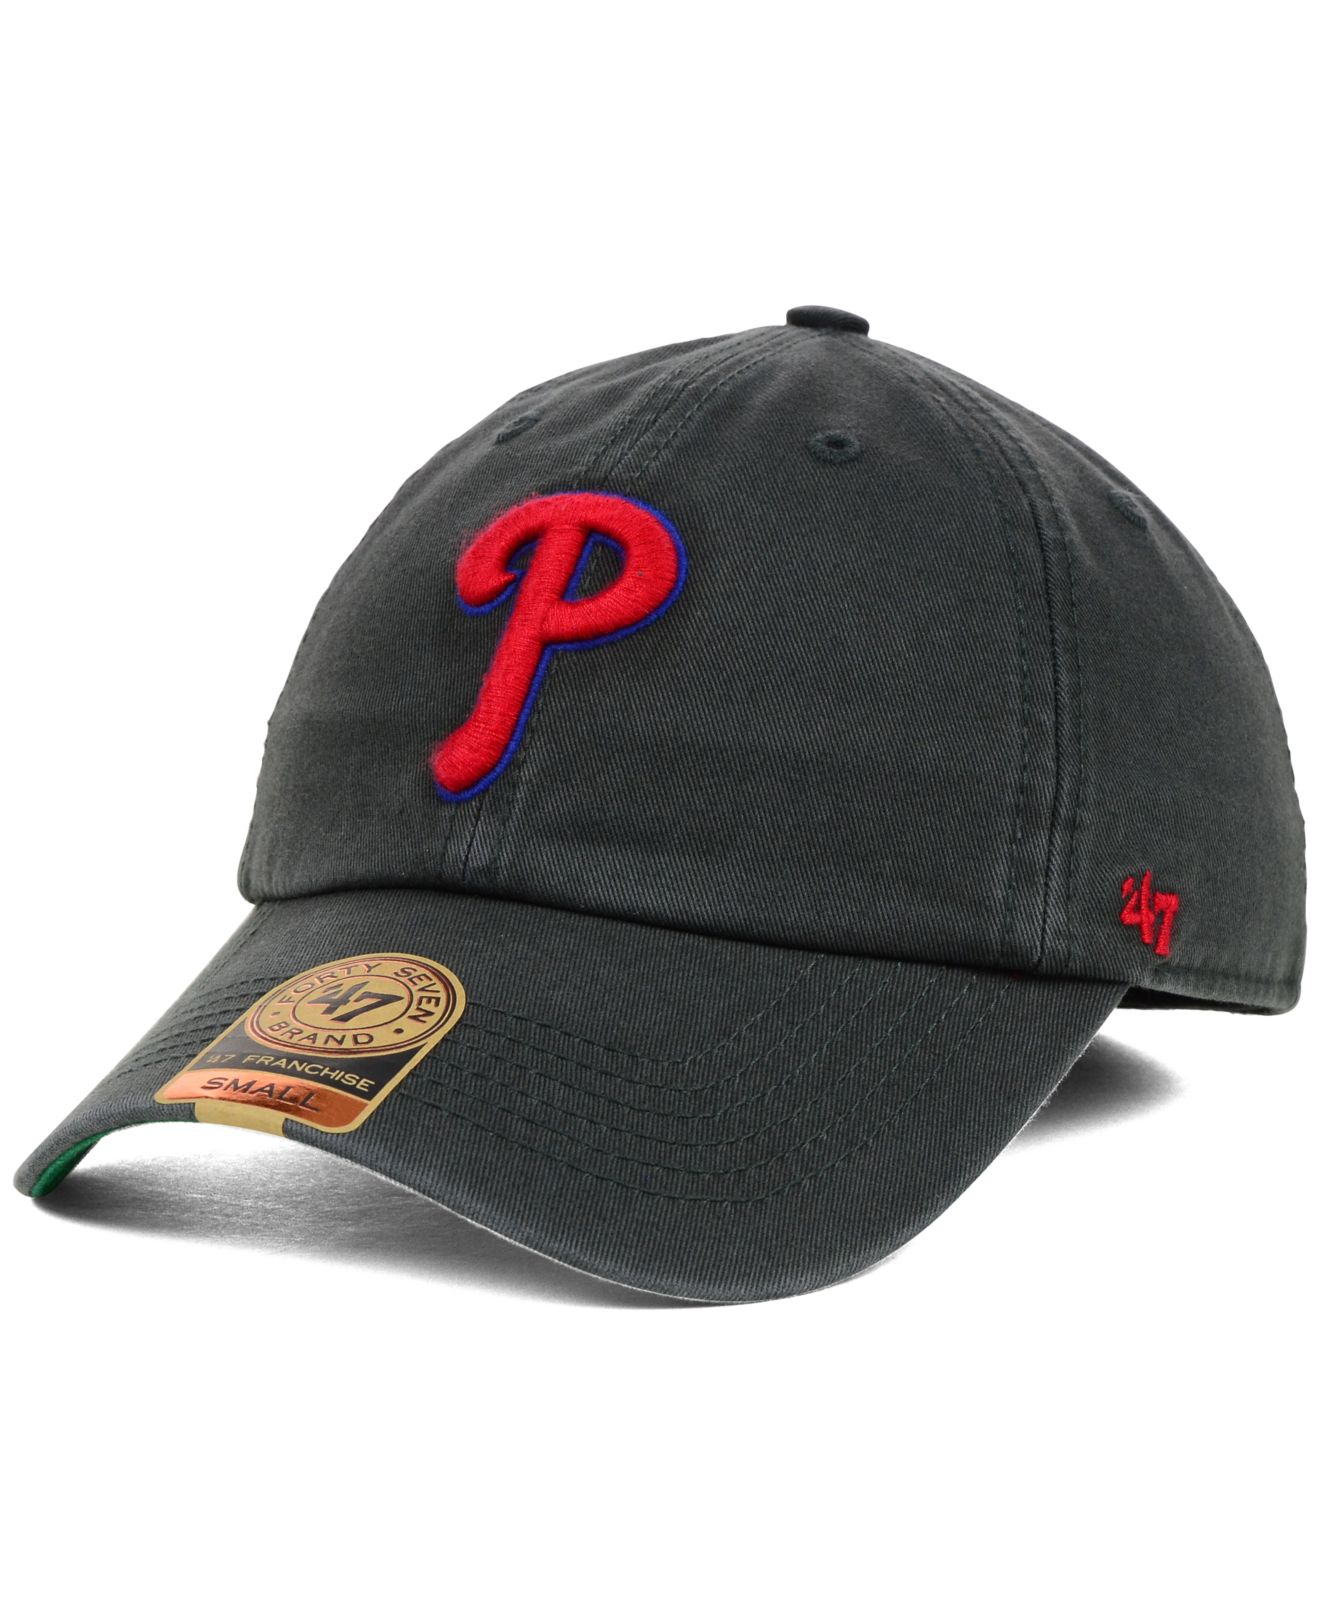 ef15cce4d40 Lyst - 47 Brand Philadelphia Phillies Mlb Hot Corner Franchise Cap ...